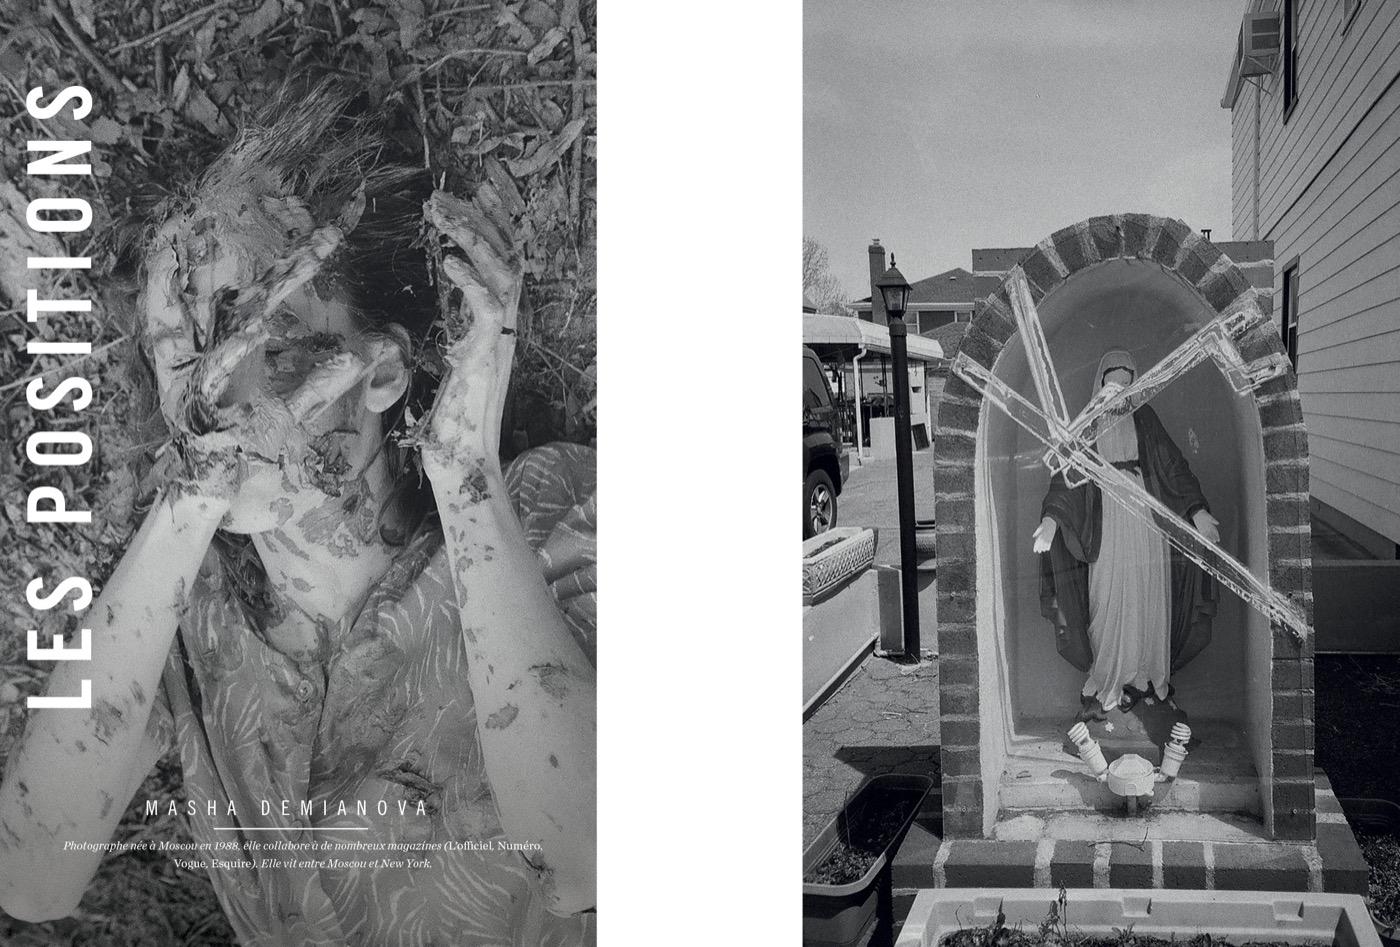 Photographies de Masha Demianova, Les Positions